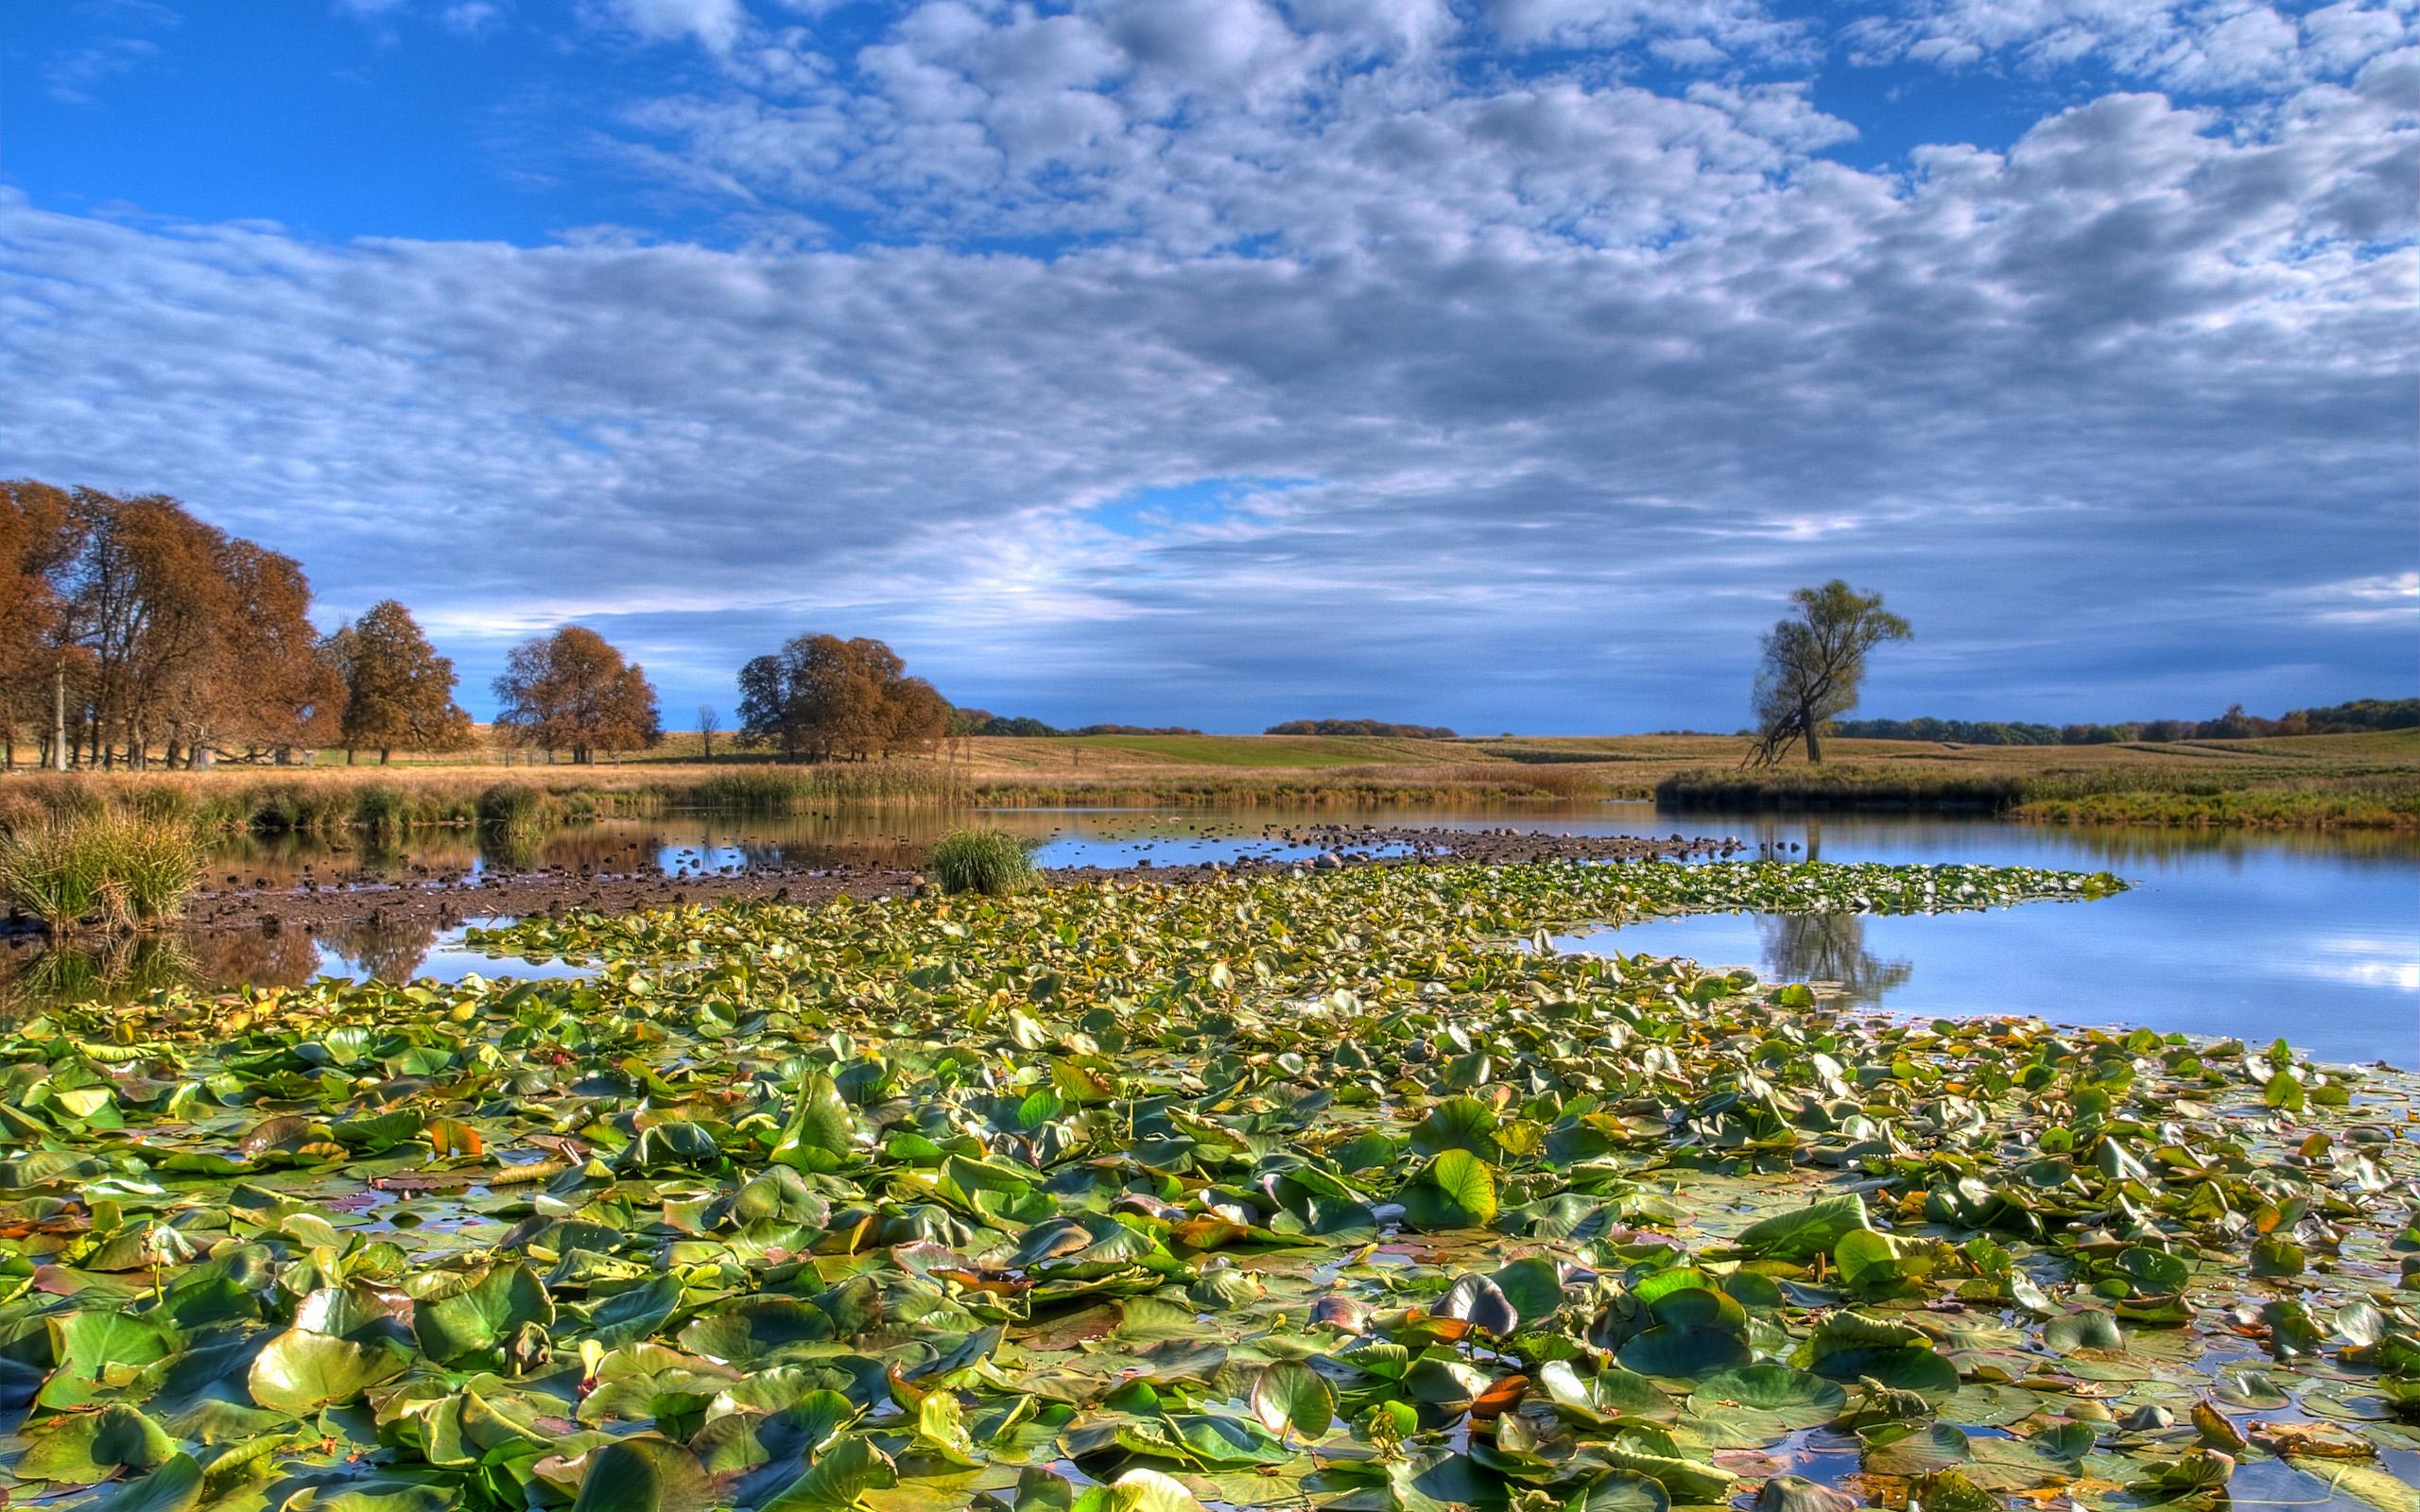 кувшинки озеро небо лес  № 1264559  скачать